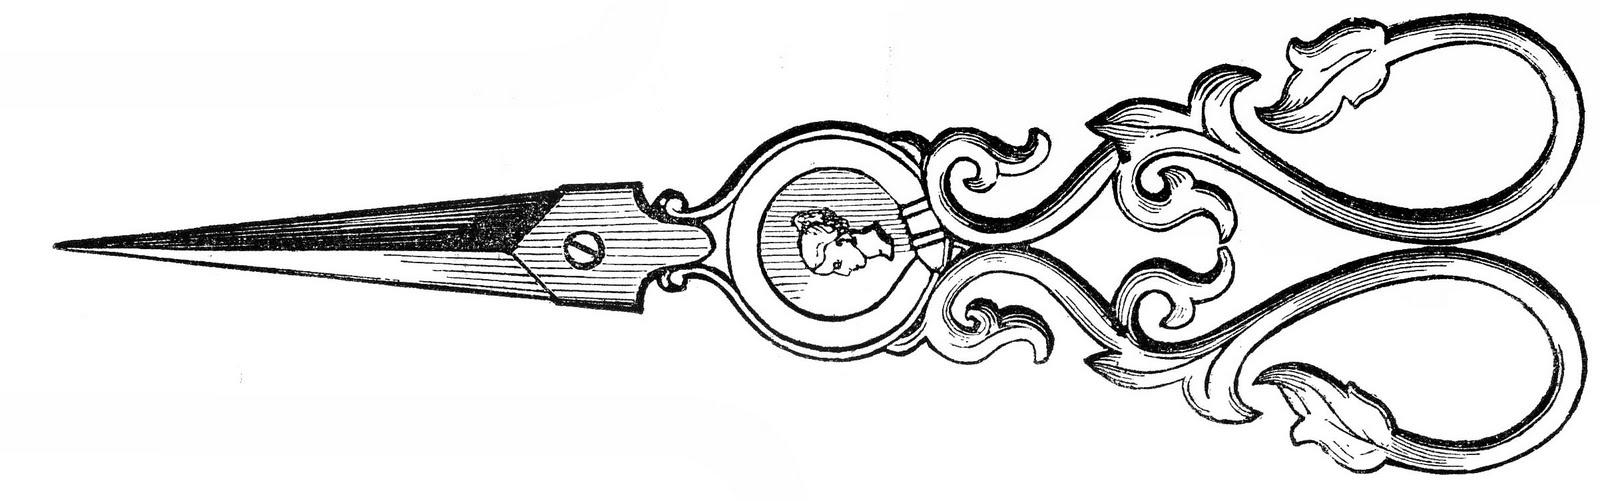 Free vintage clip art ladies ornate sewing scissors the